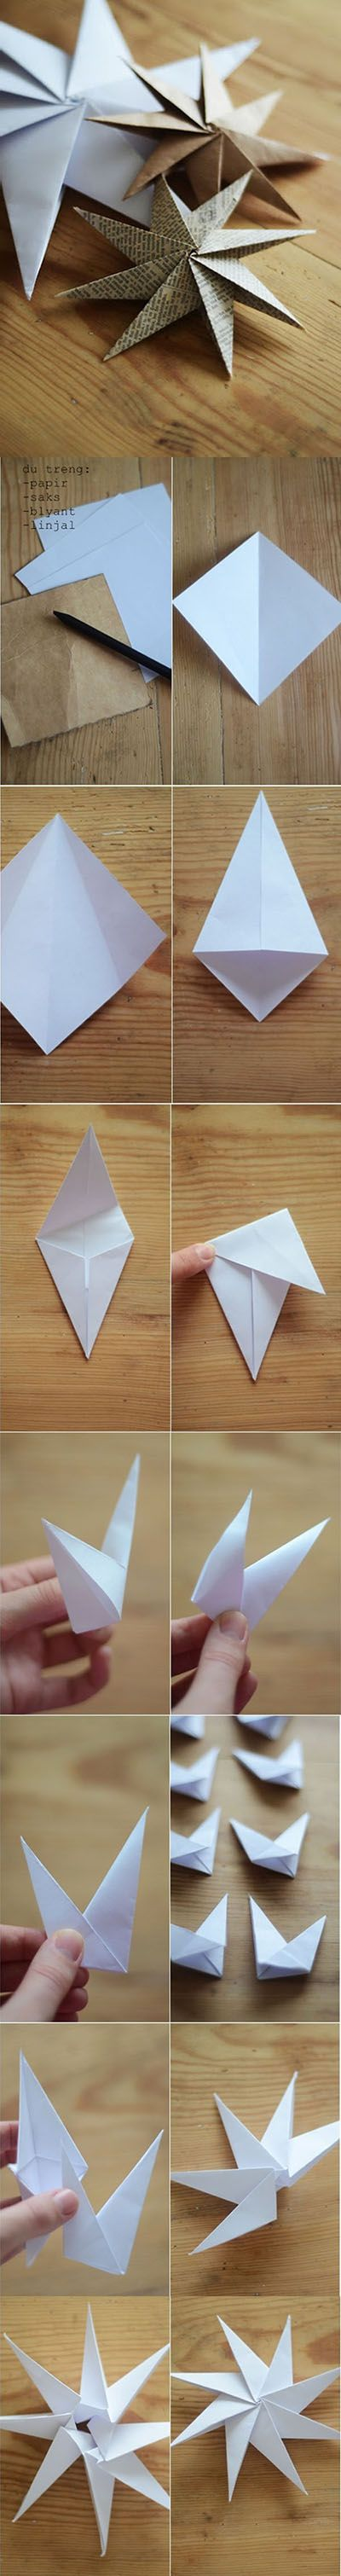 Easy And Beautiful Paper Craft | DIY & Crafts Tutorials